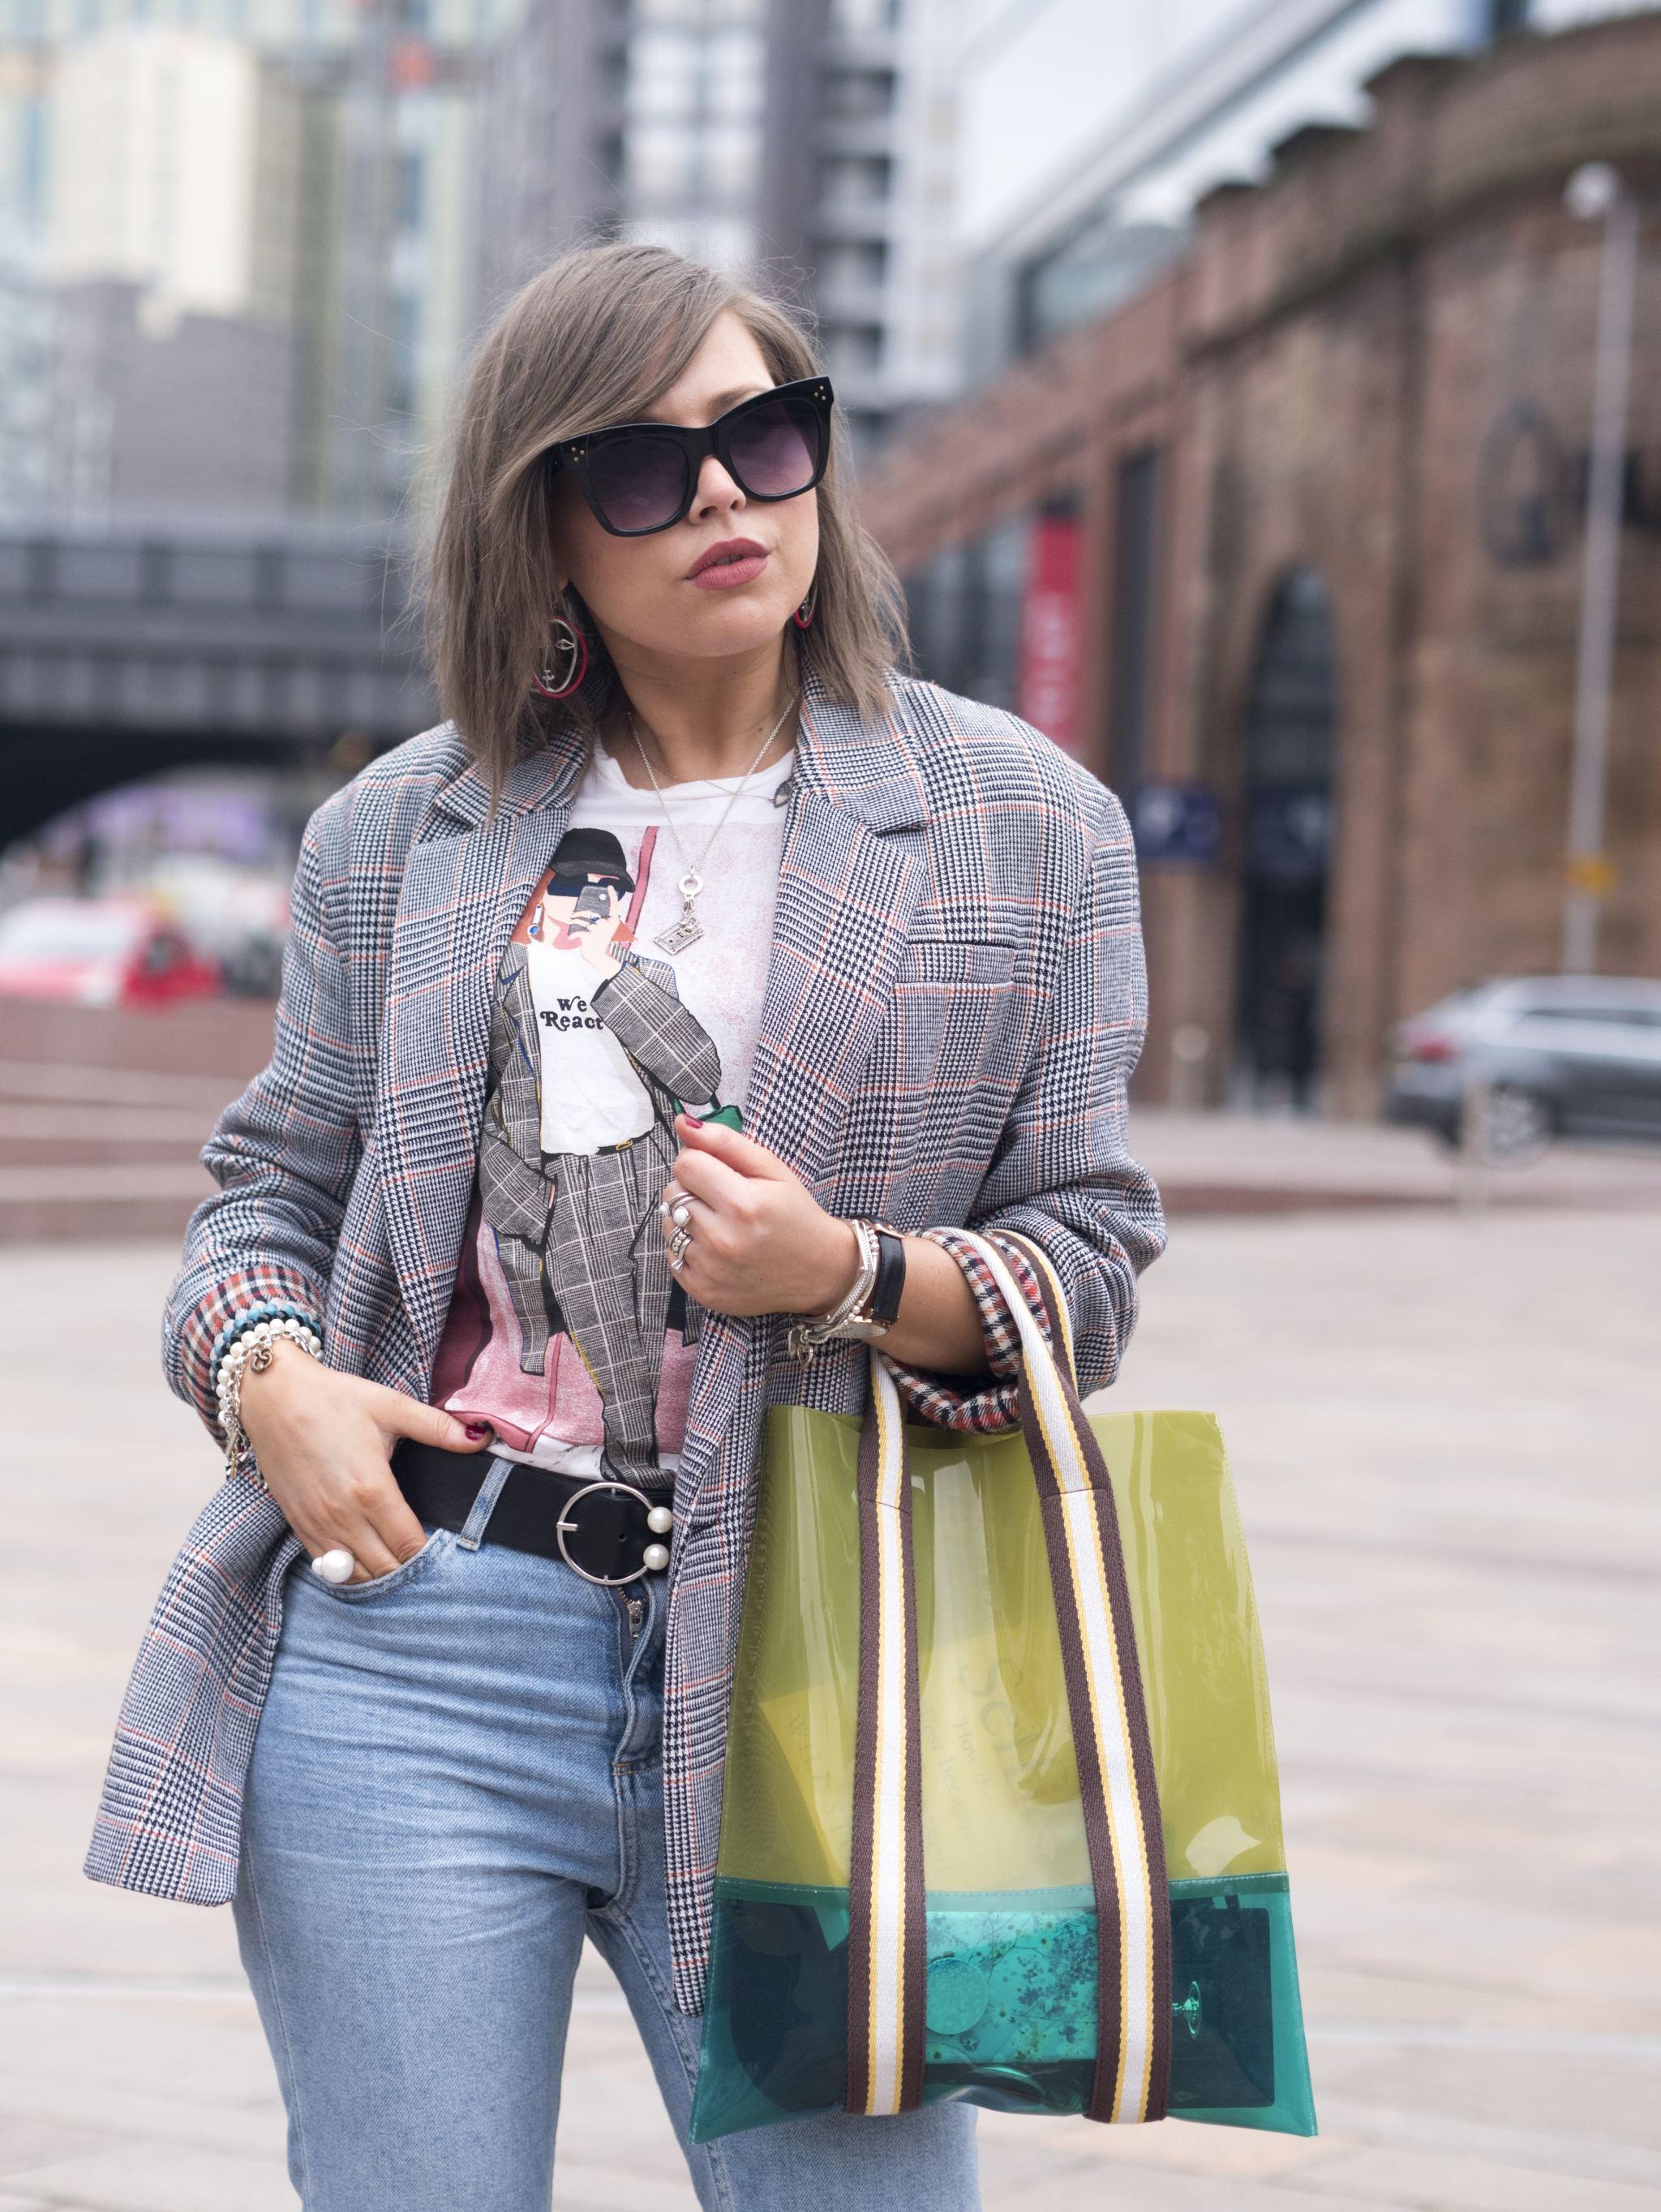 manchester fashion blogger , fashion blogger, celine sunglasses, oversized zara blazer, dress scandinavian, pernille teisbaek ,manchester